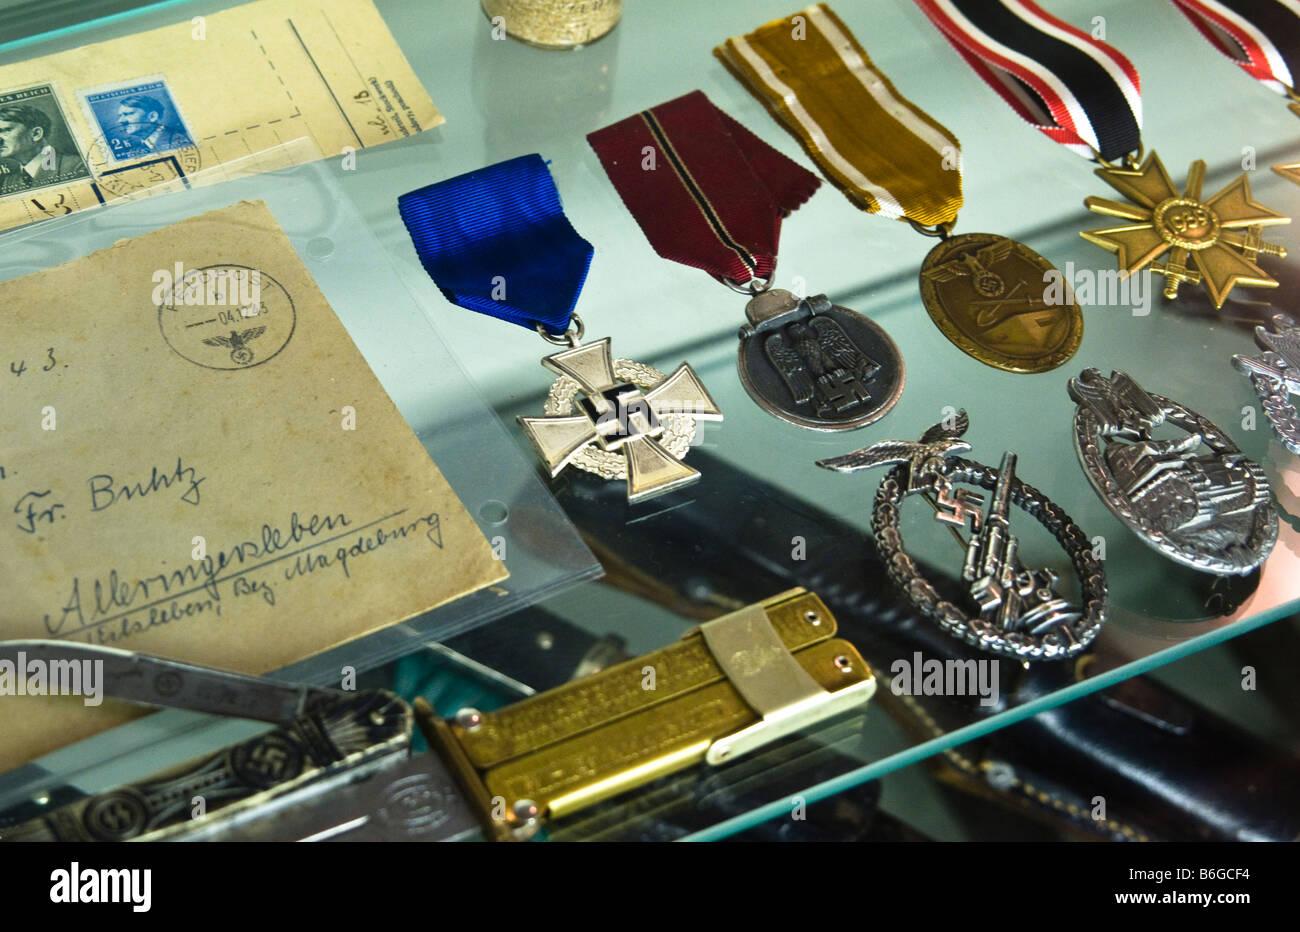 Collectors display case of Nazi war memorabilia. - Stock Image